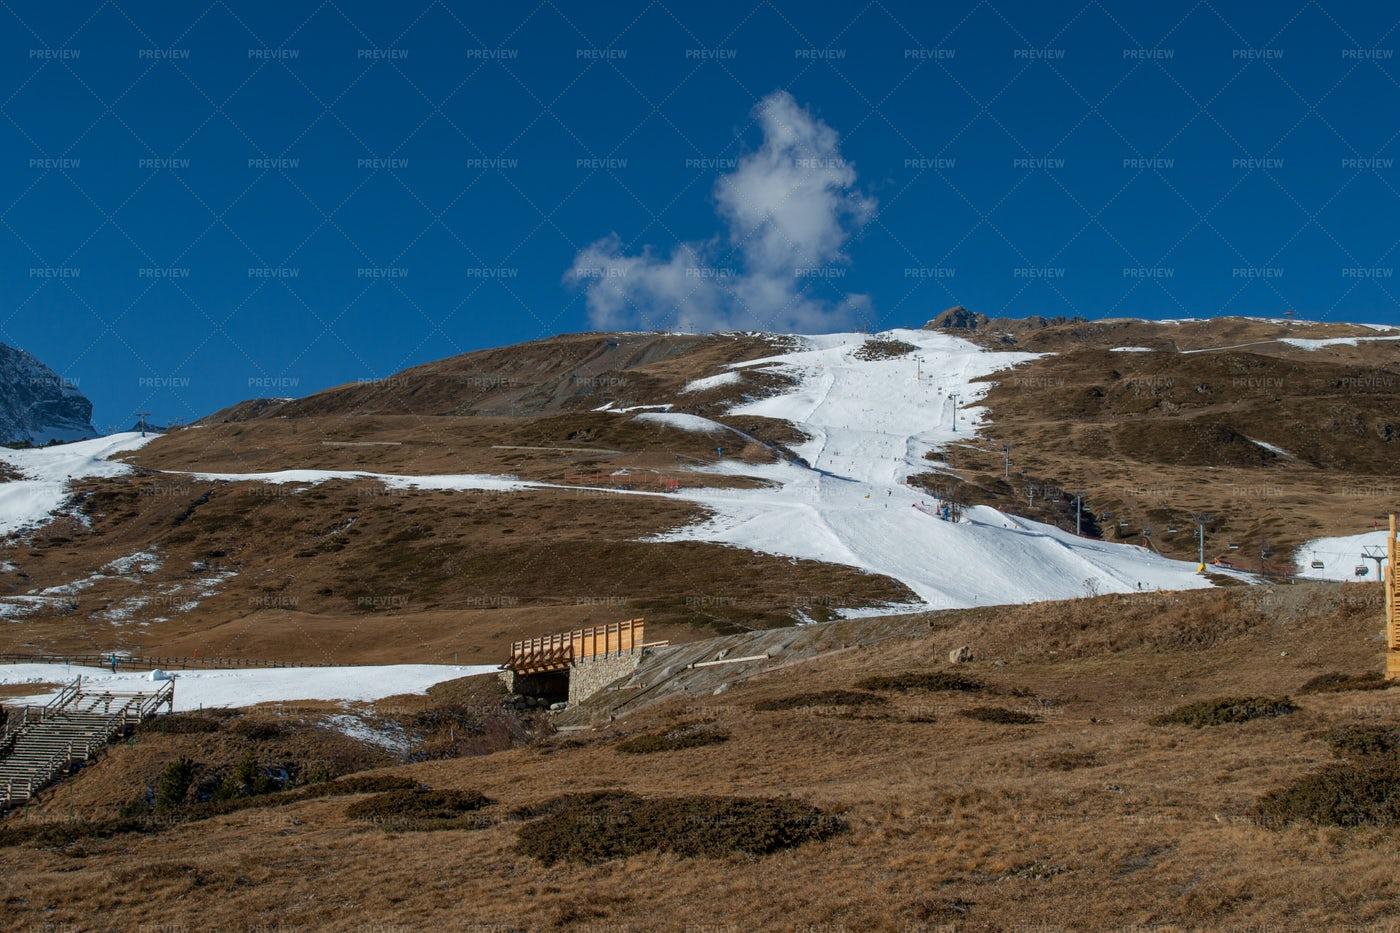 Ski Slope With Artificial Snow: Stock Photos